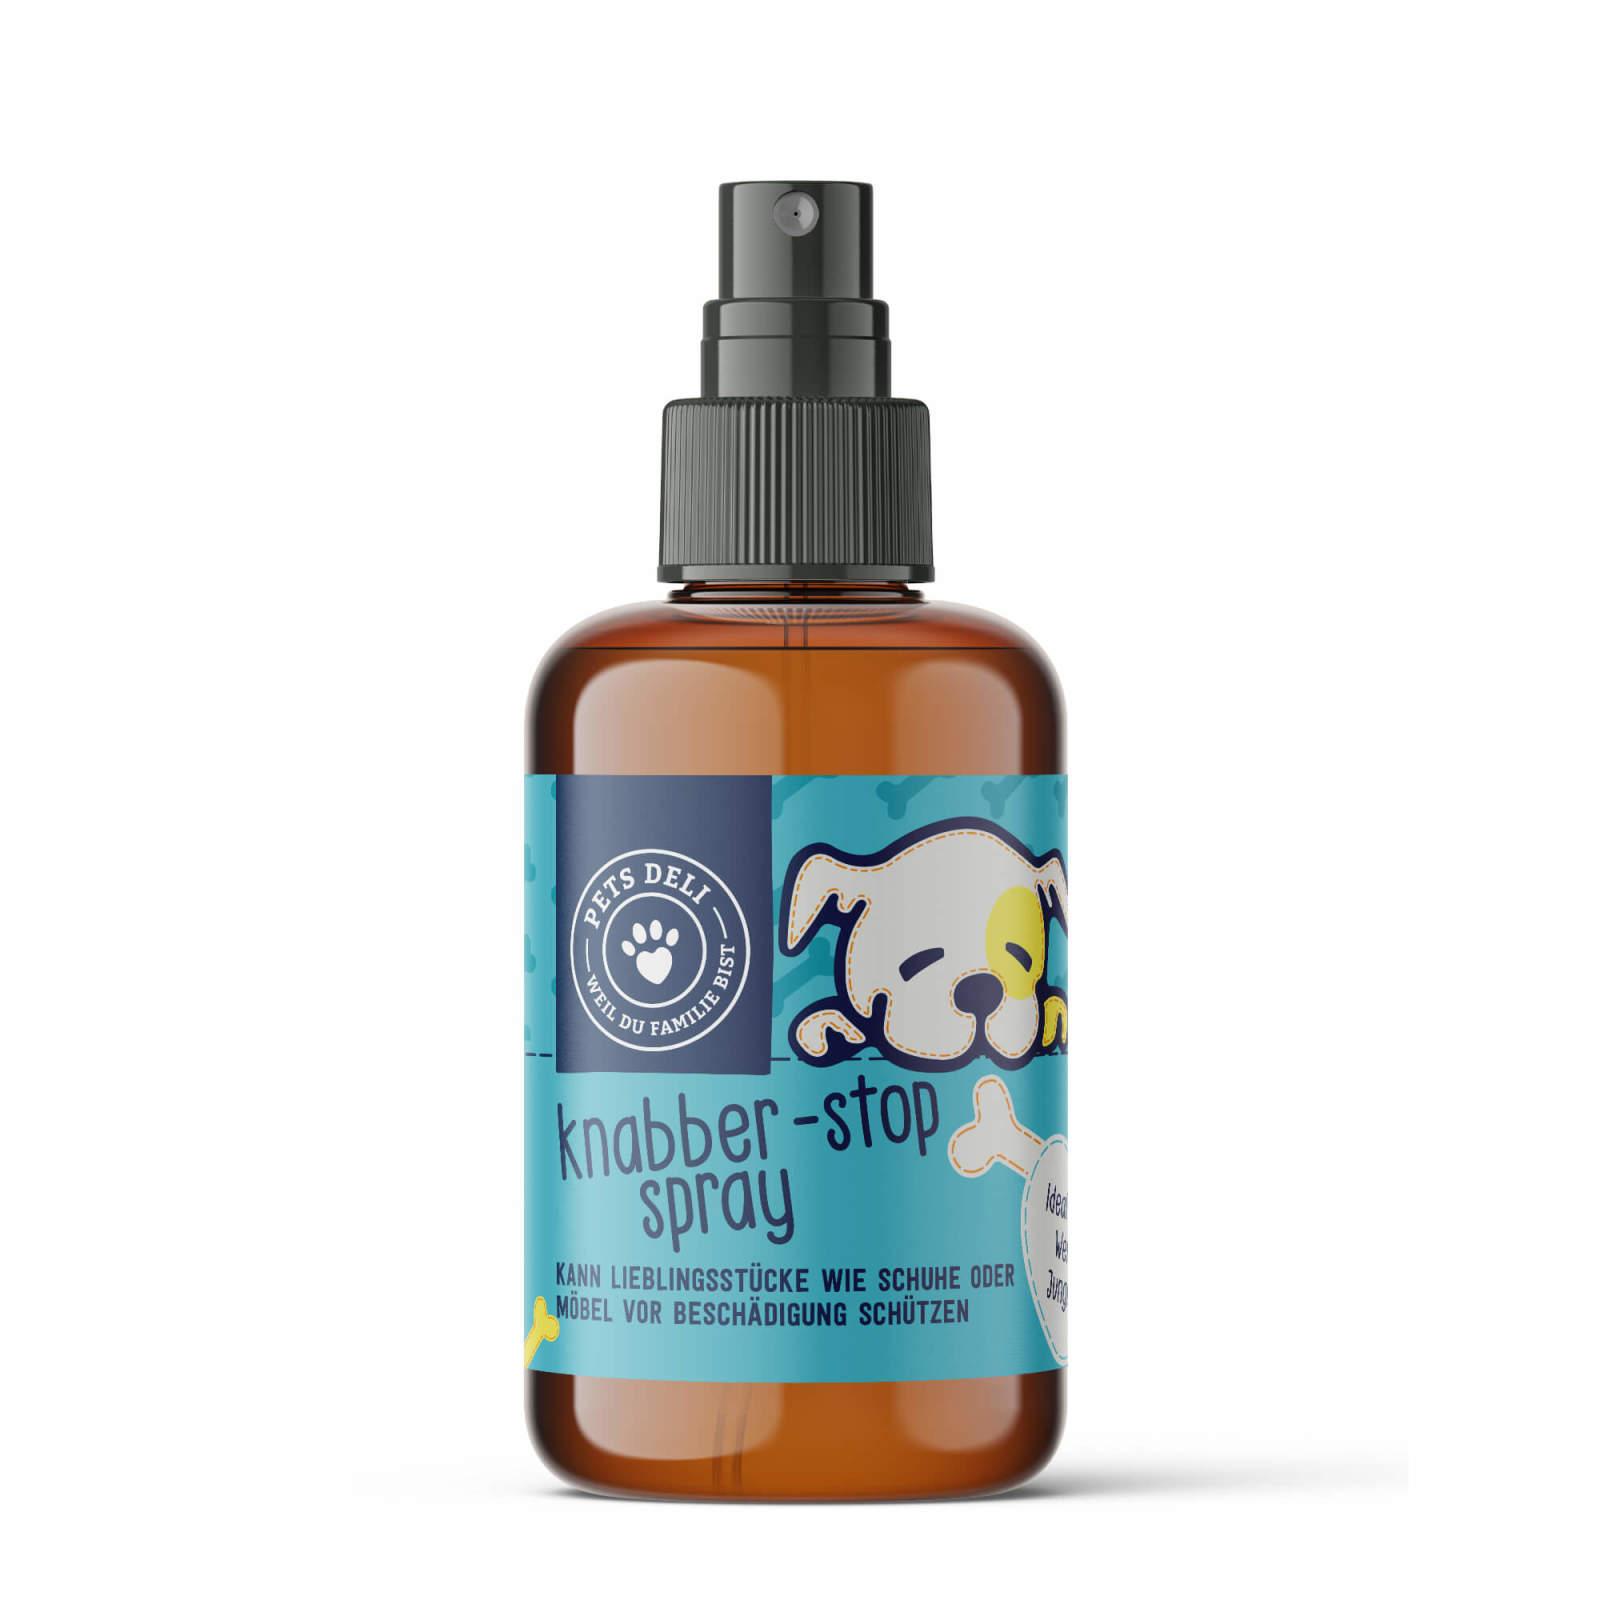 pd-hund-knabber-stop-spray-01